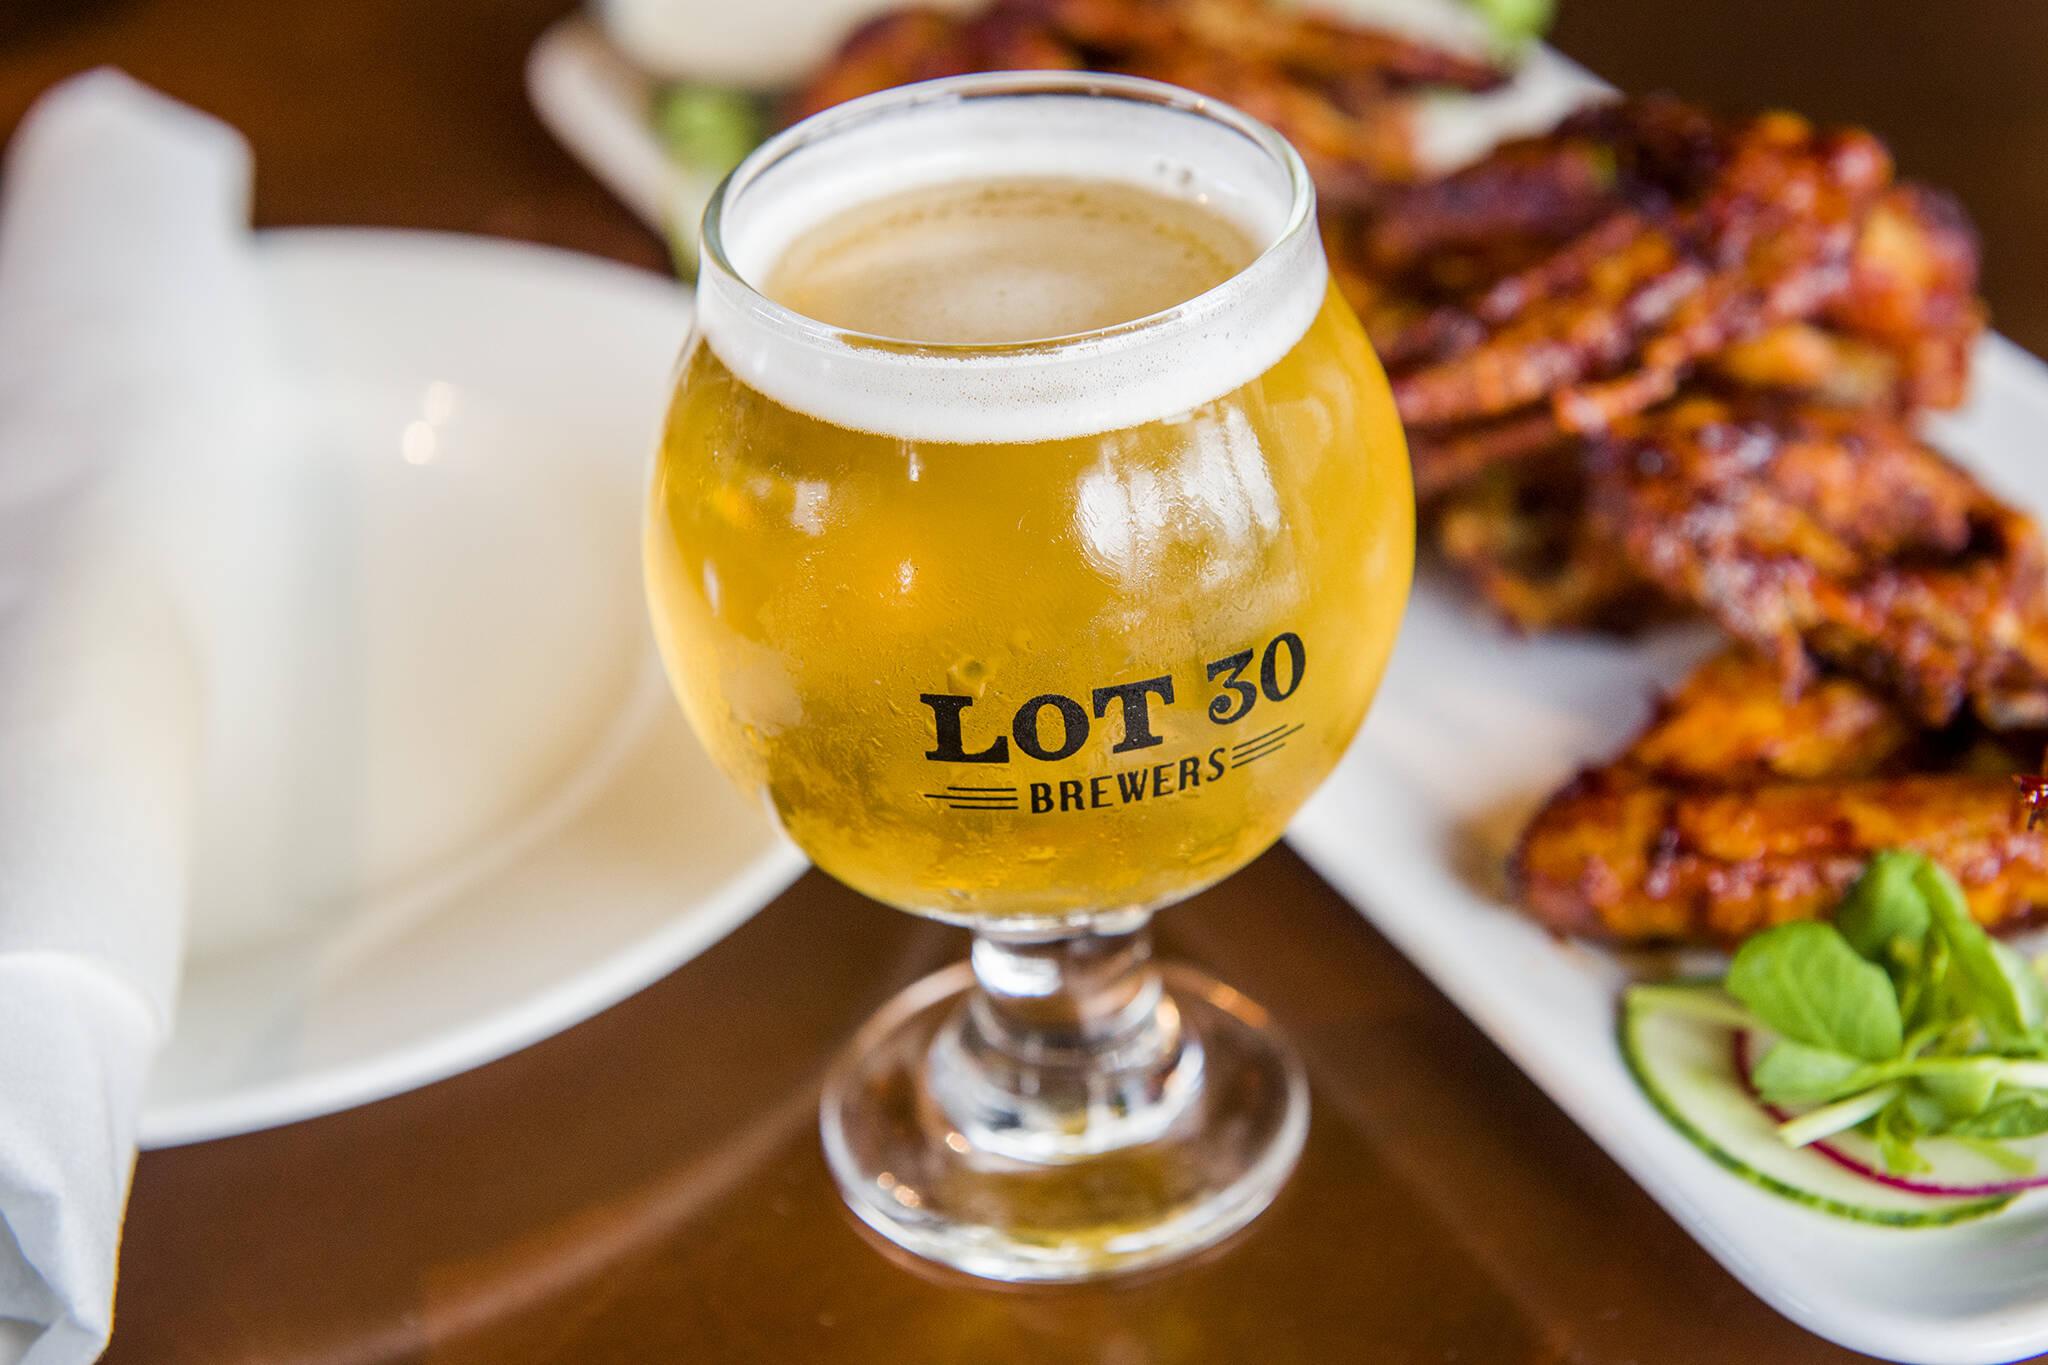 Lot 30 Brewers Toronto